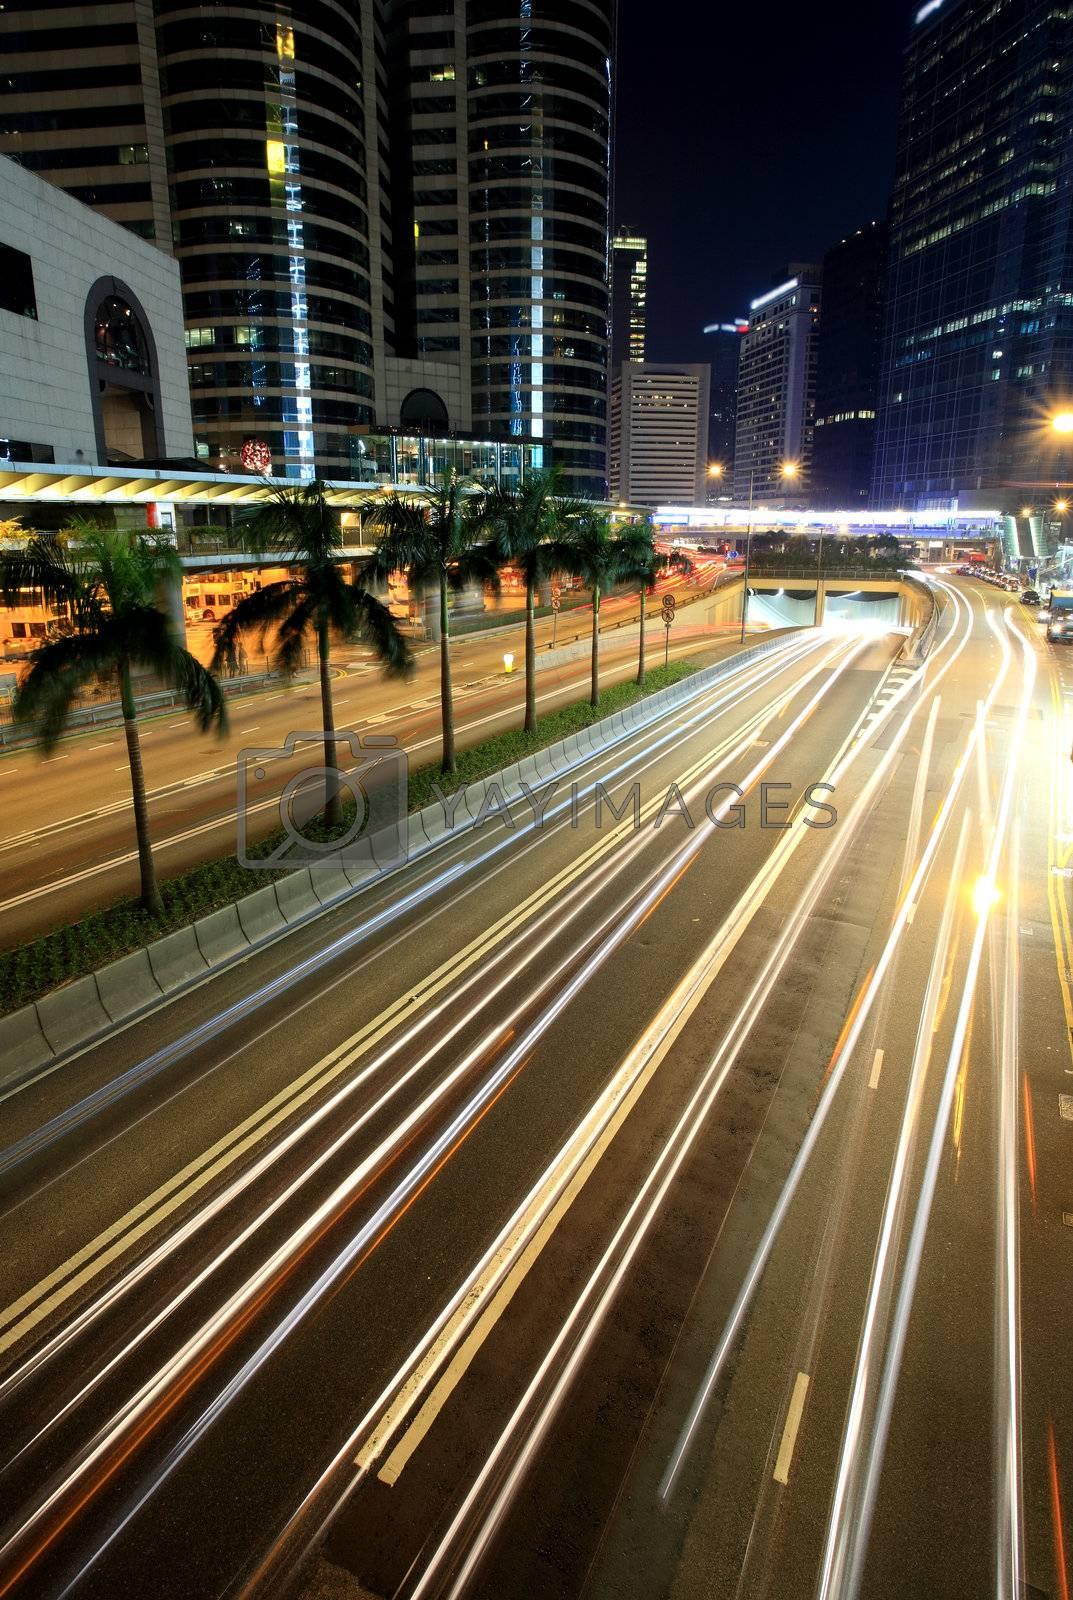 Royalty free image of Traffic in Hong Kong by leungchopan